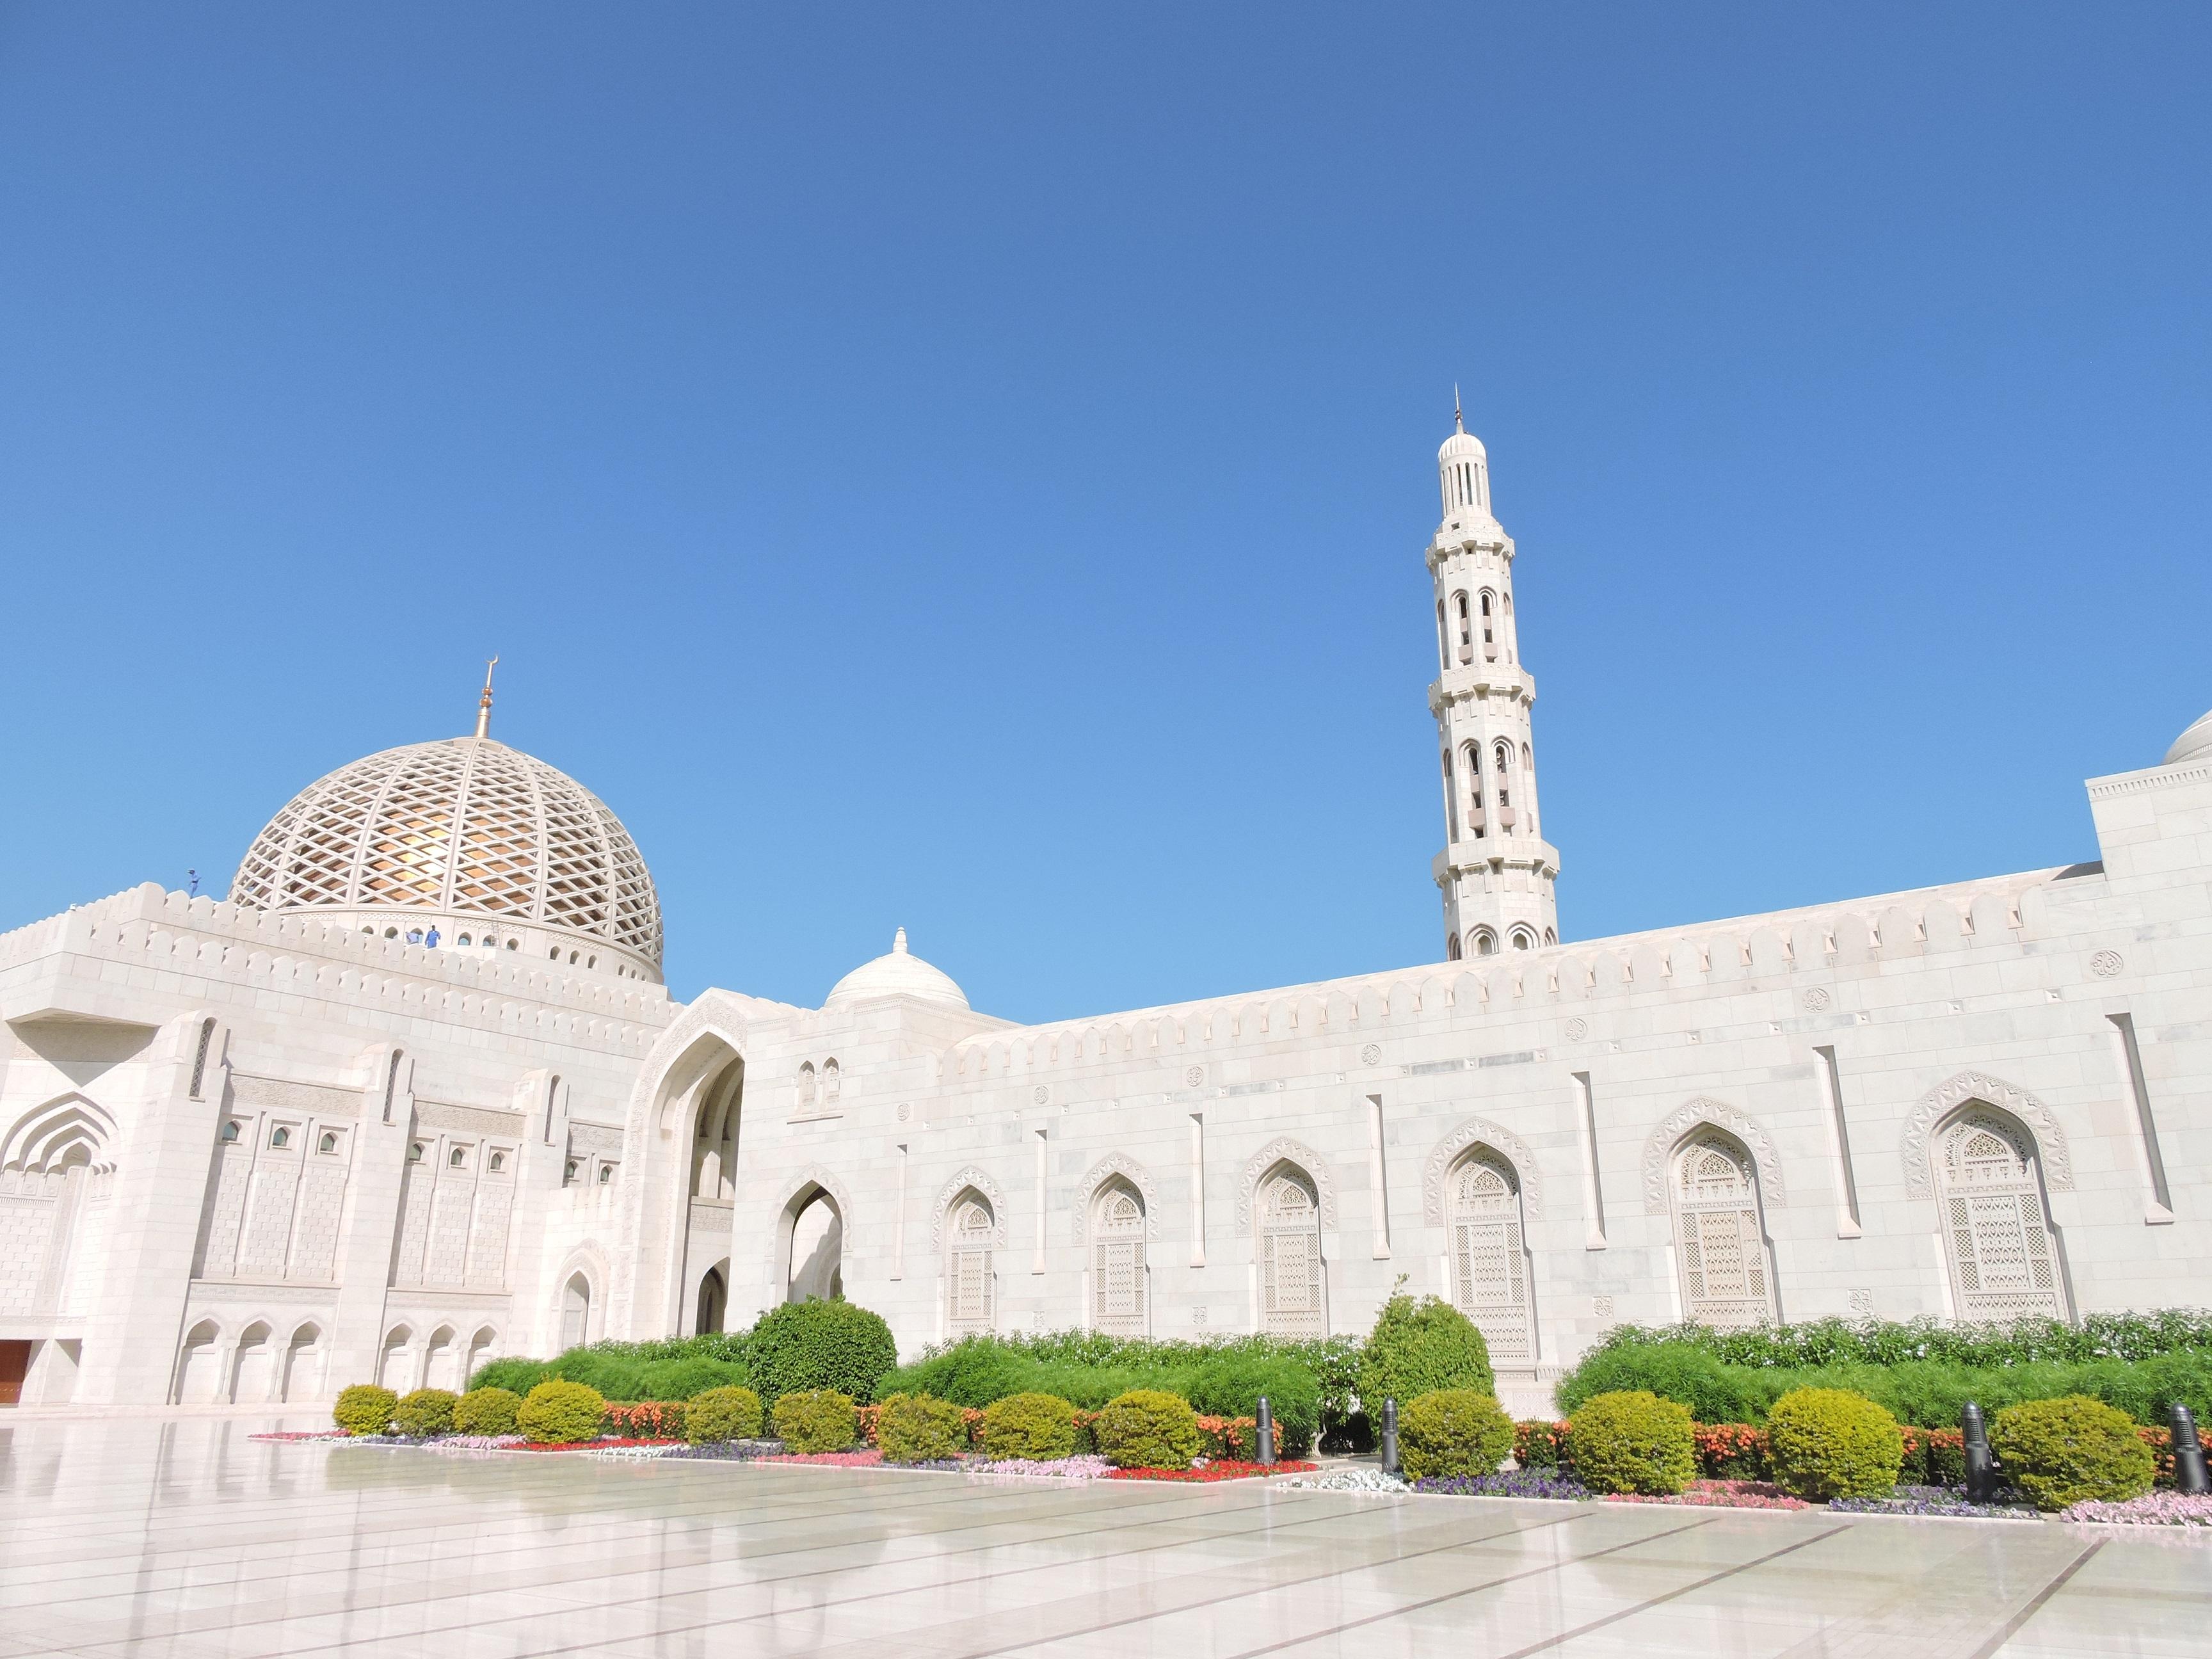 Mosquée Sultan Qaboos Mascate Oman